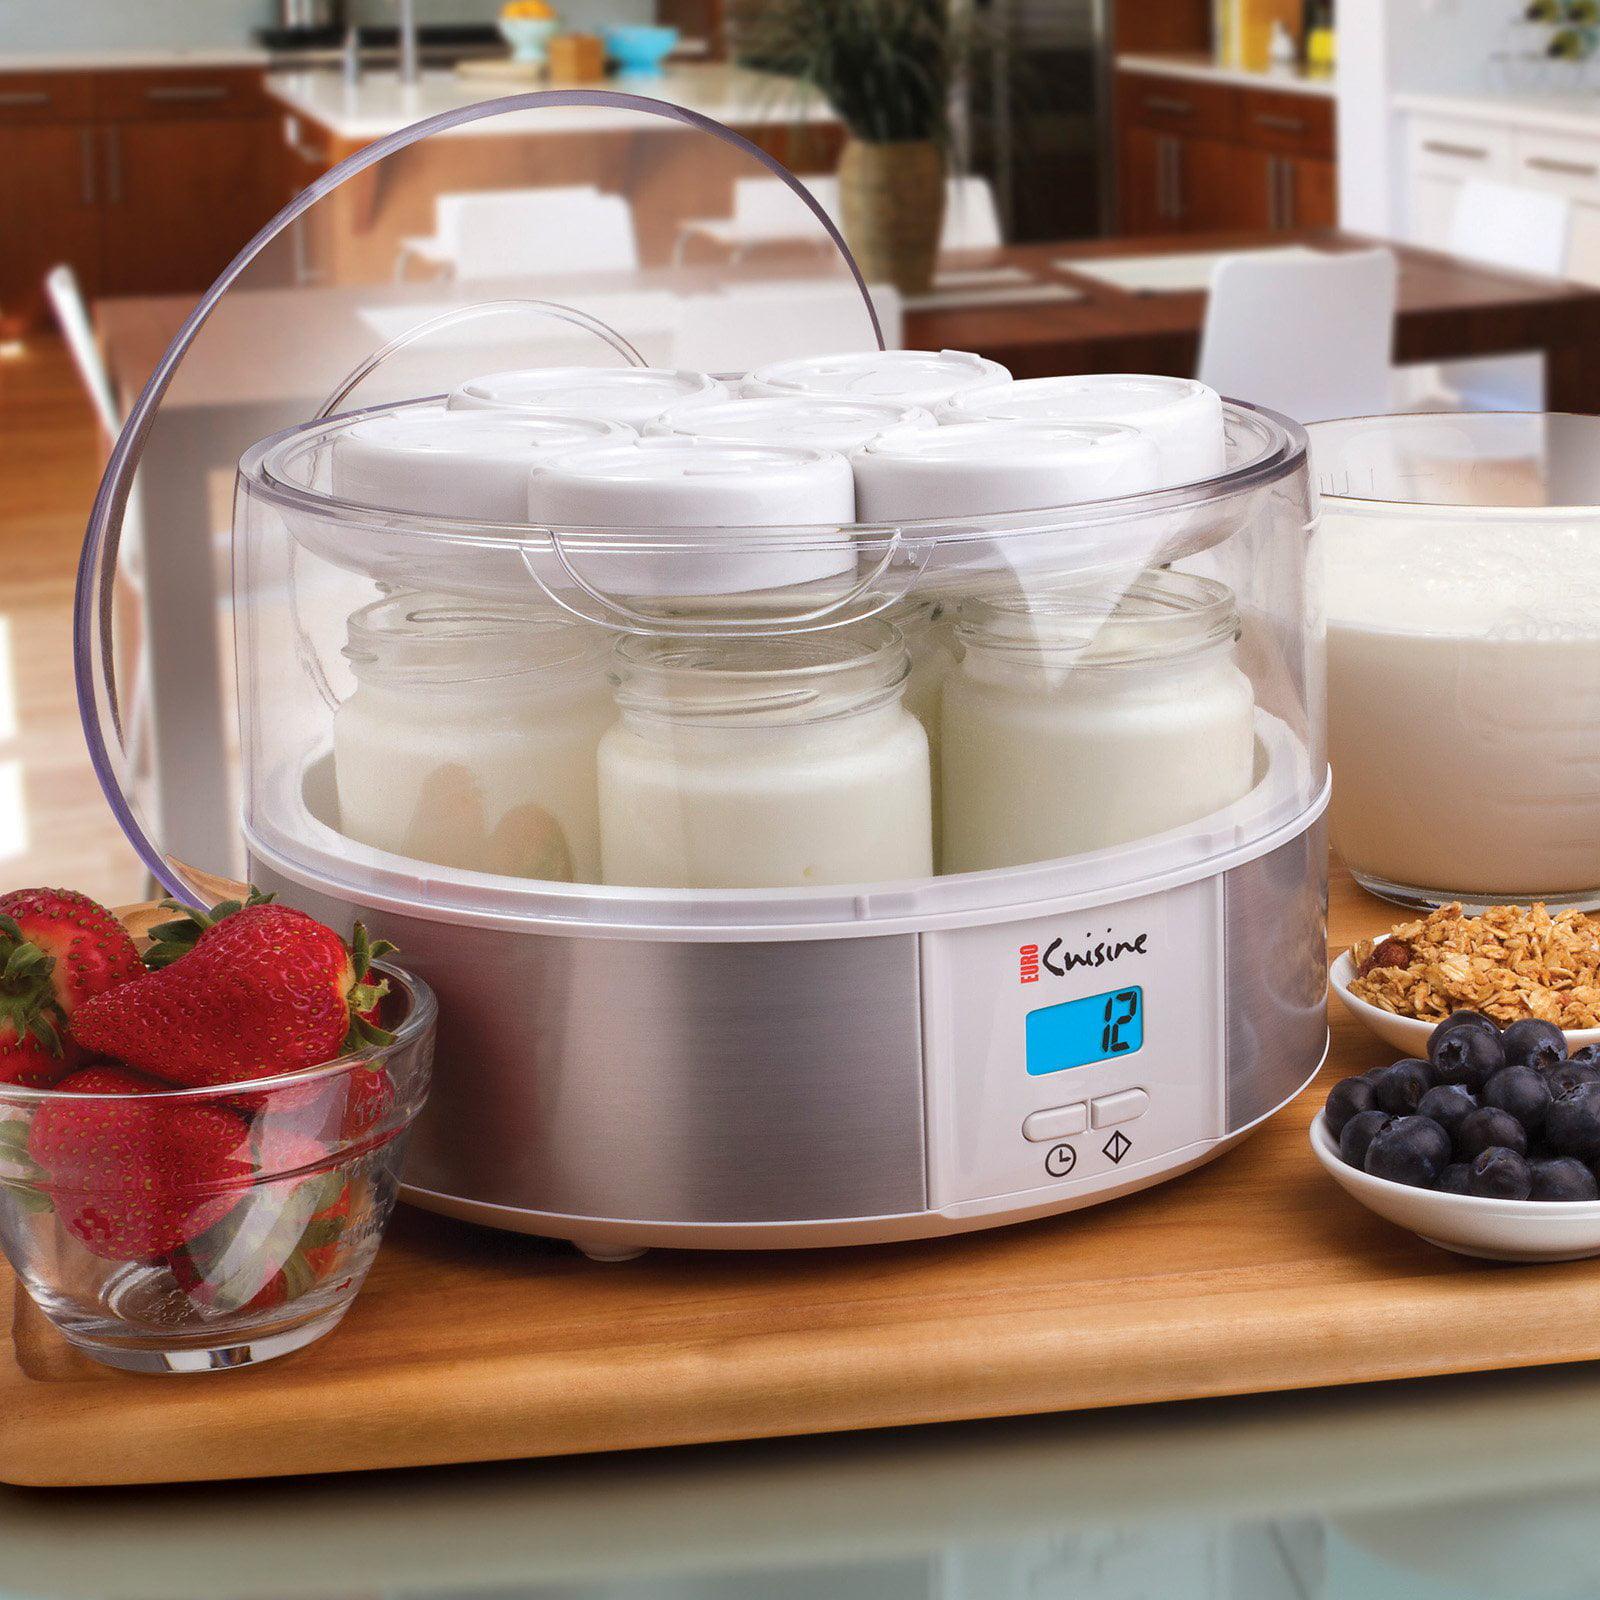 Euro Cuisine Digital Yogurt Maker